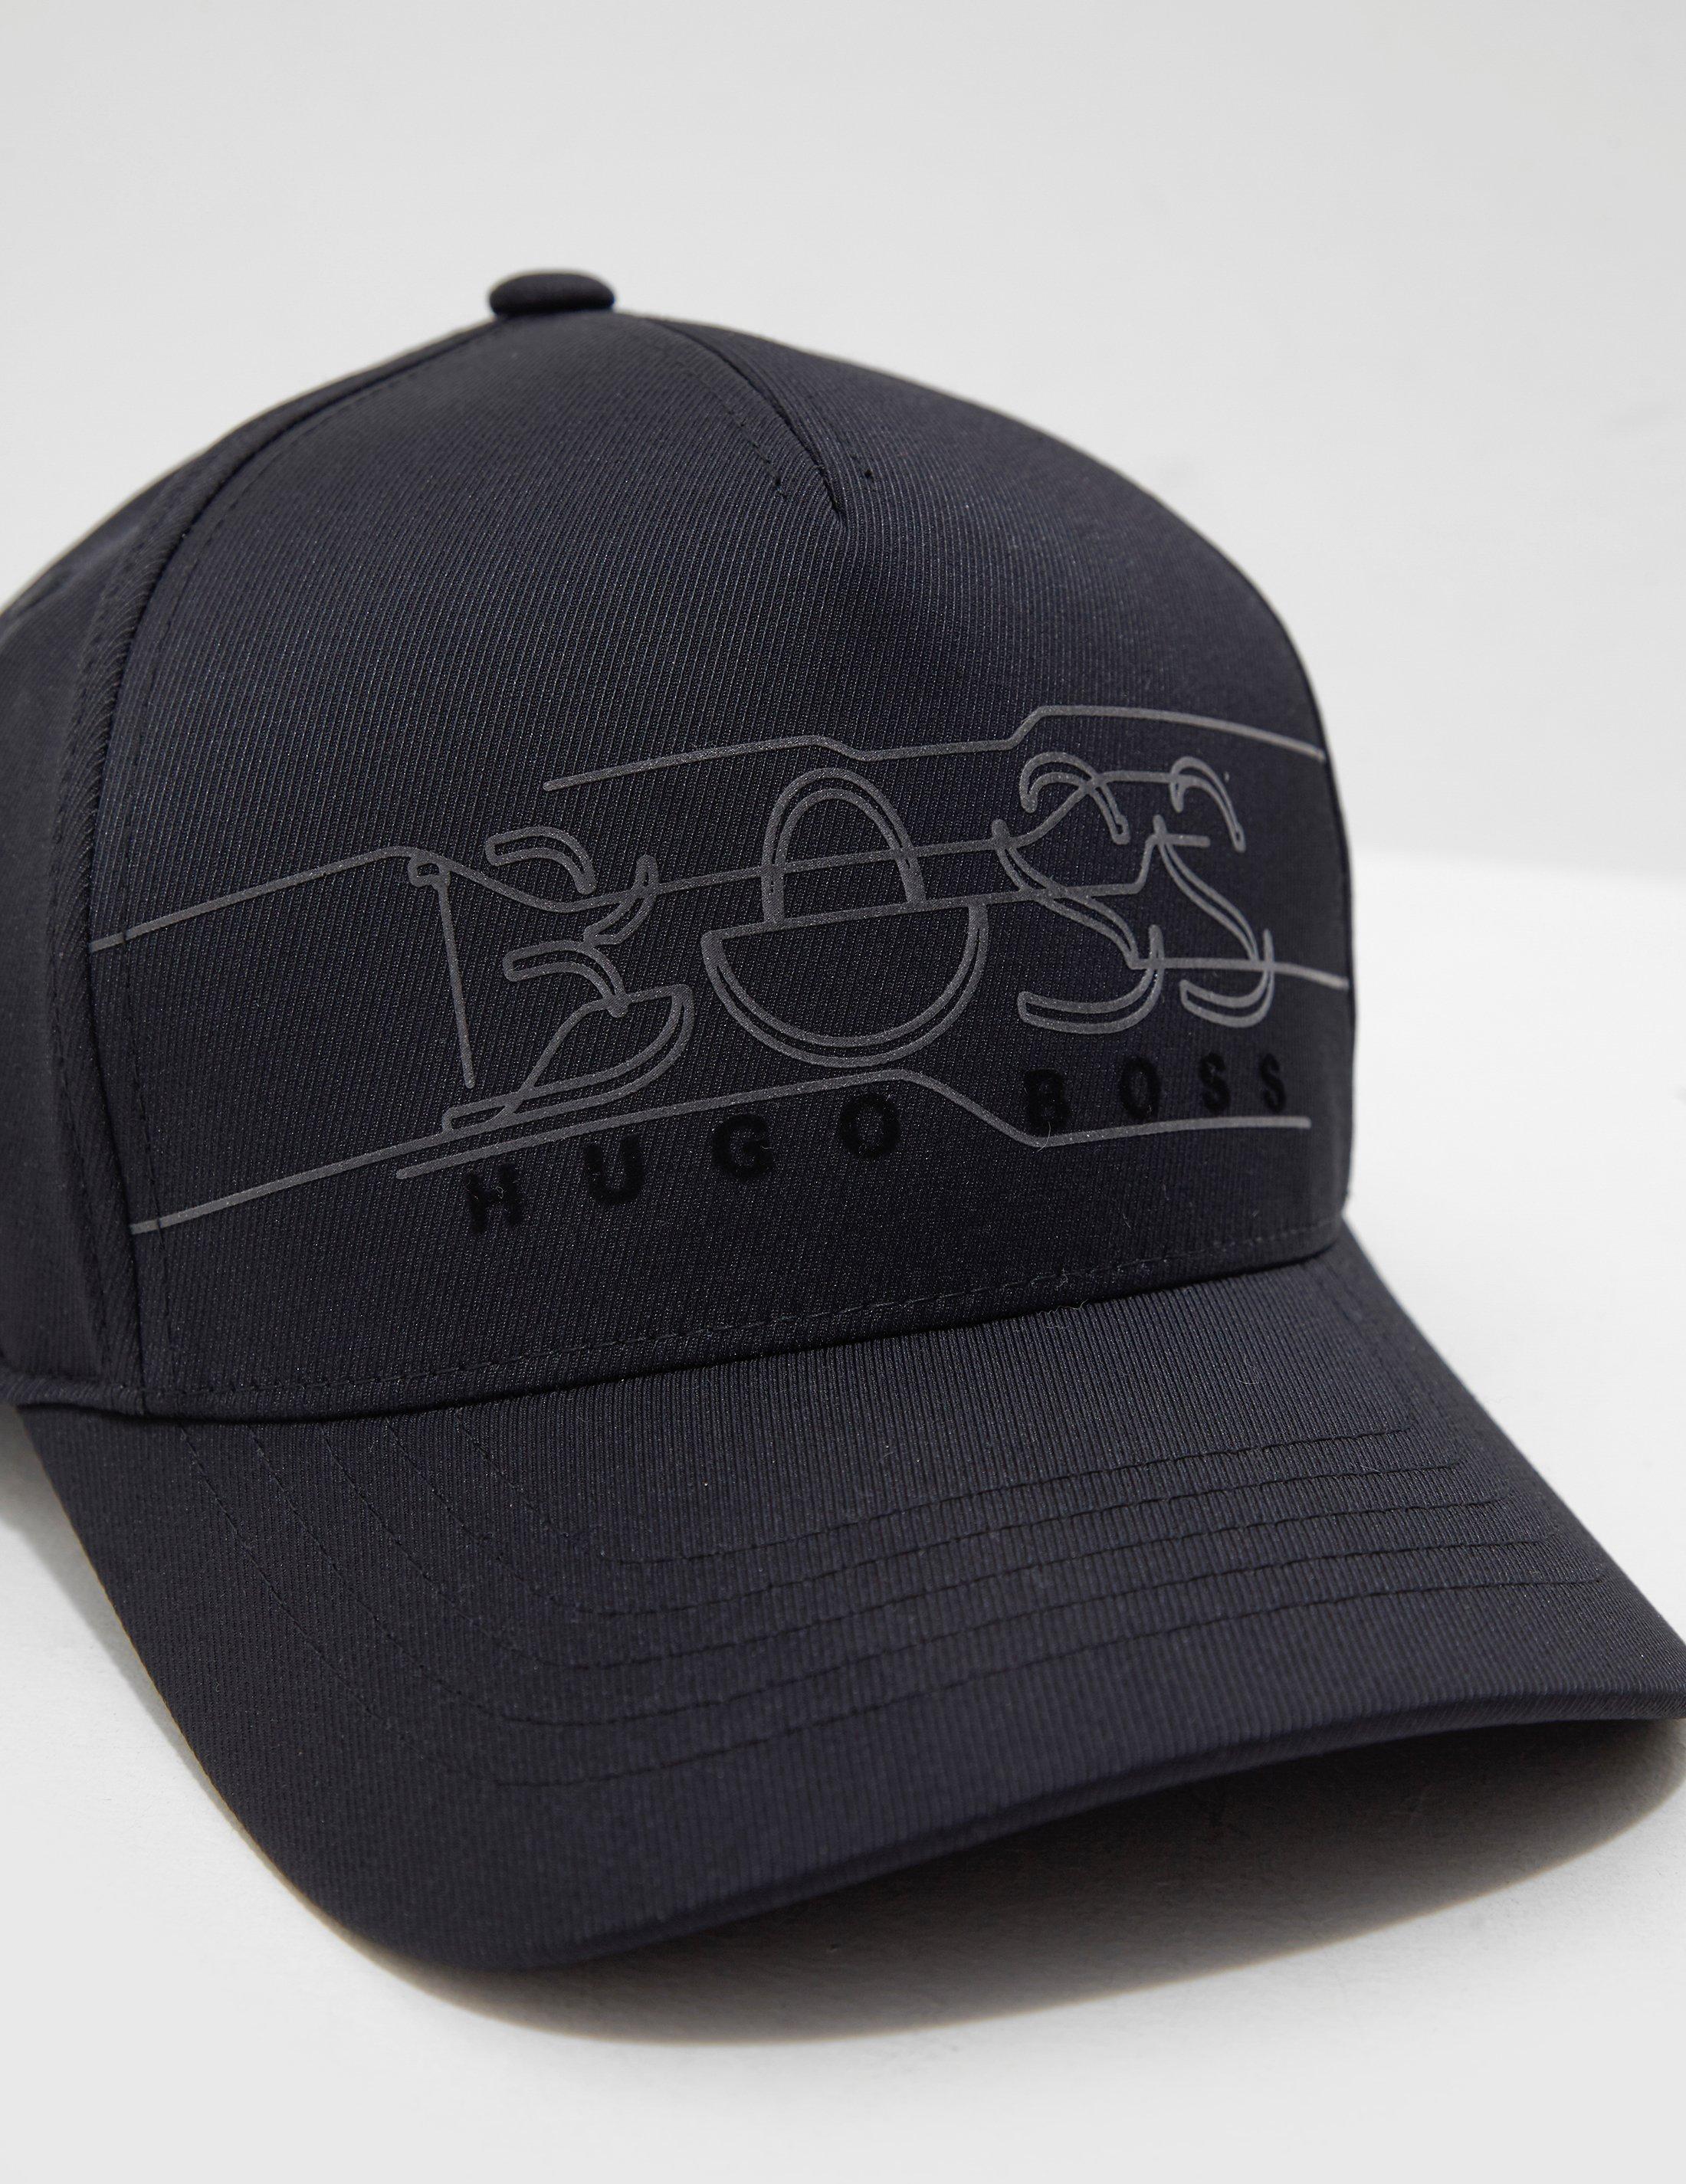 Boss Mens Reflective Logo Cap Black in Black for Men - Lyst 6c220ab051b9